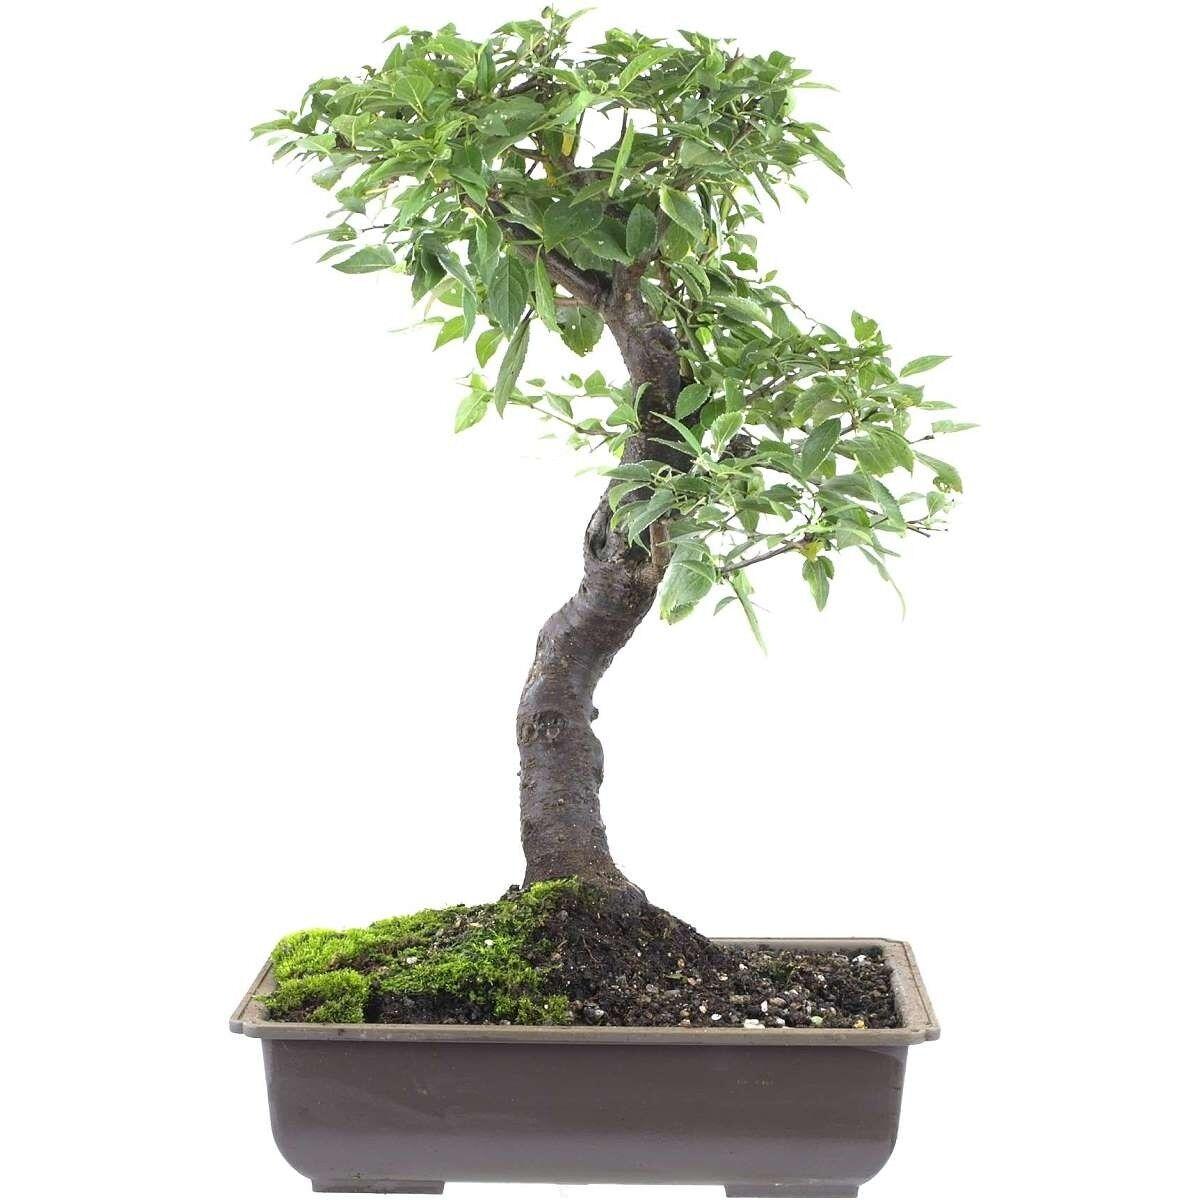 Kirschpflaume, bonsai, 14 años, 49cm (141-43)